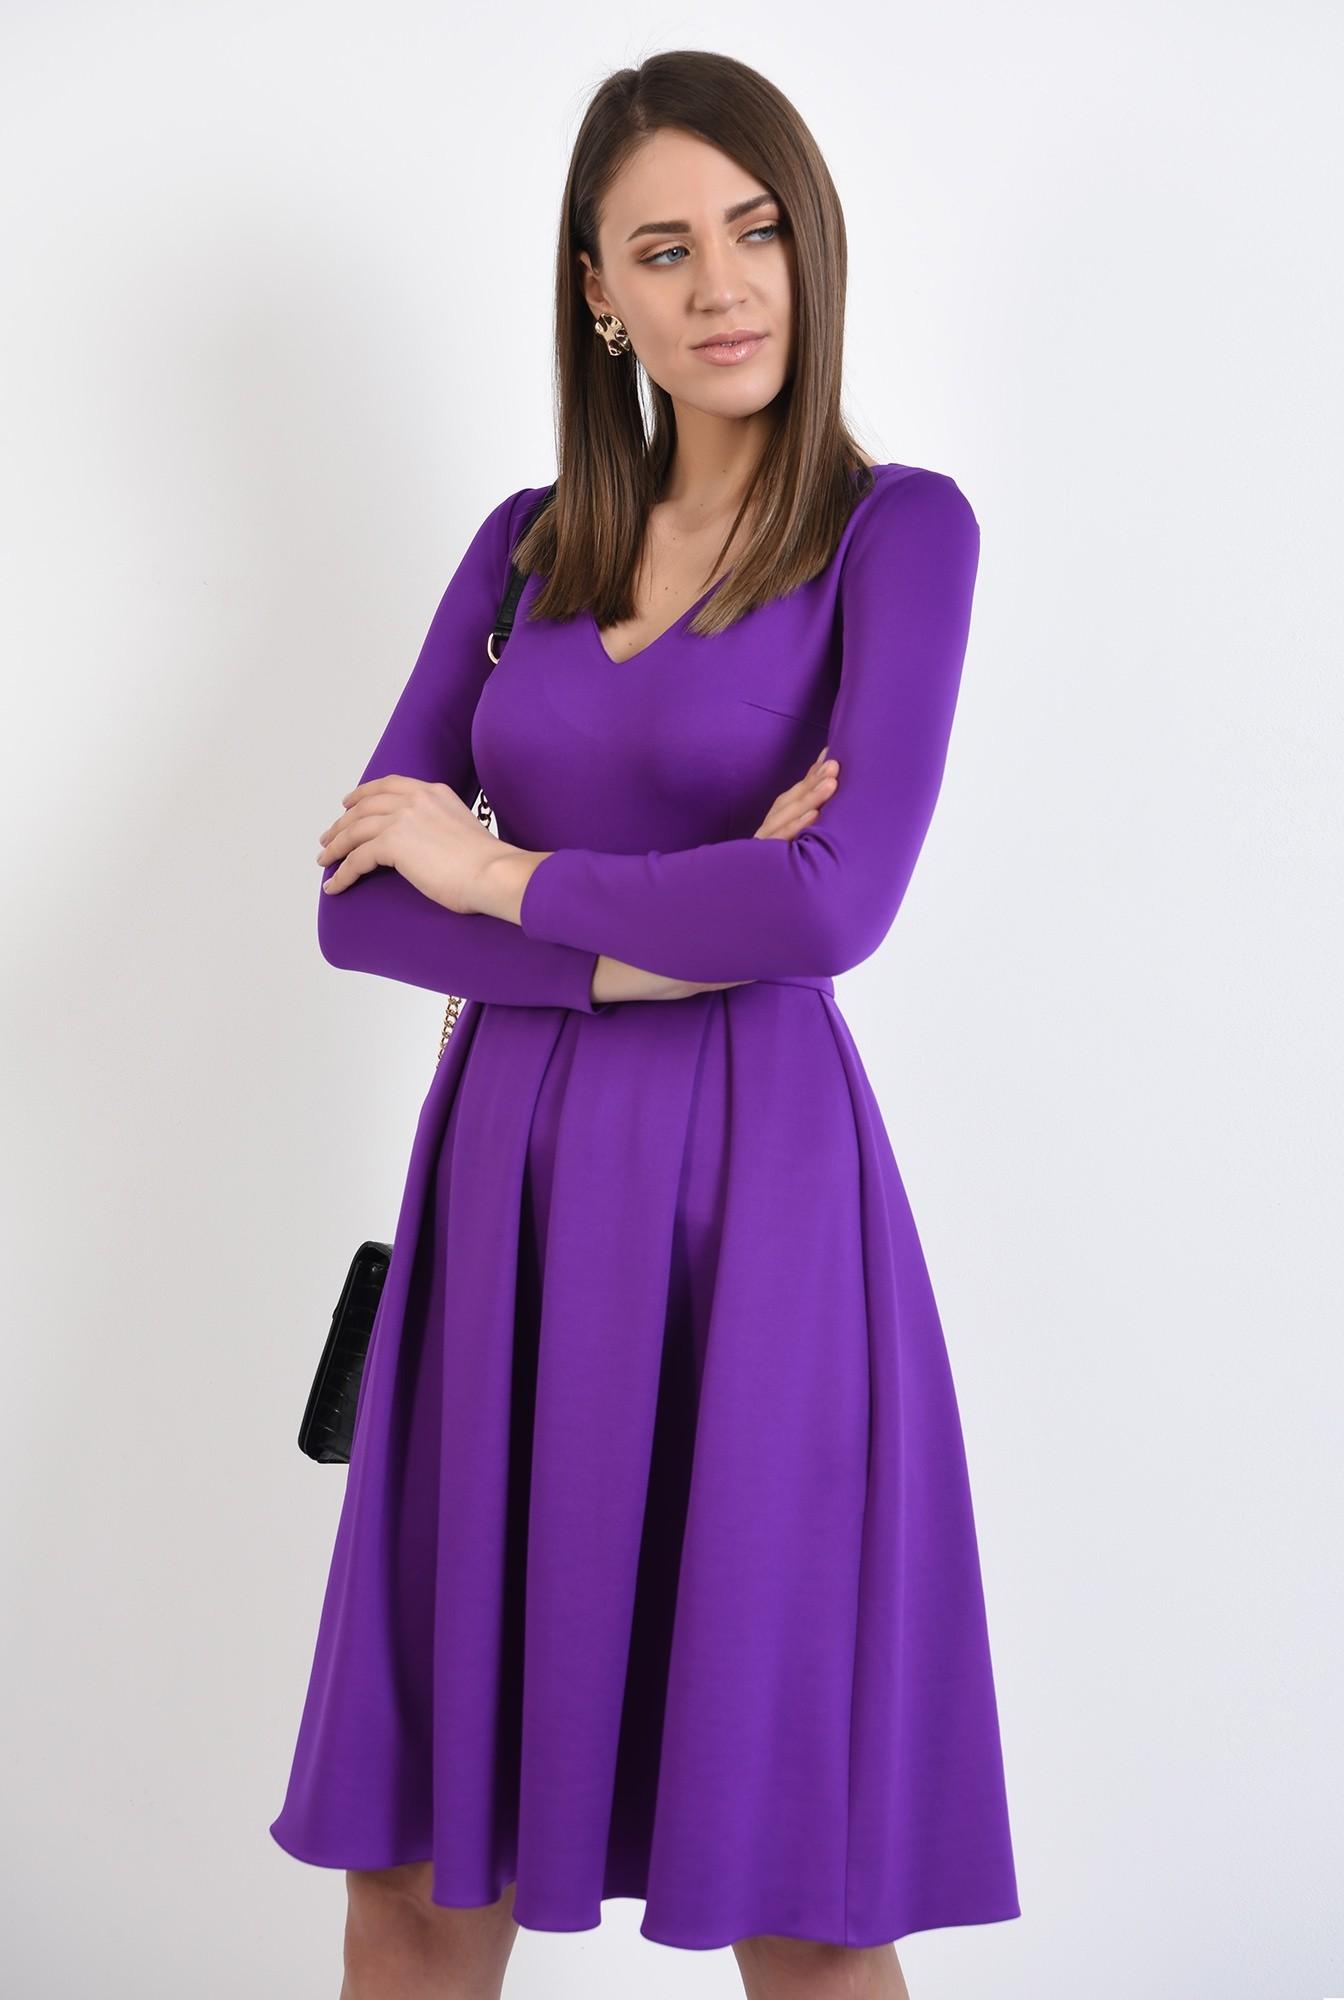 2 - rochie eleganta, evazata, mov, cu pliuri late, maneci stretch